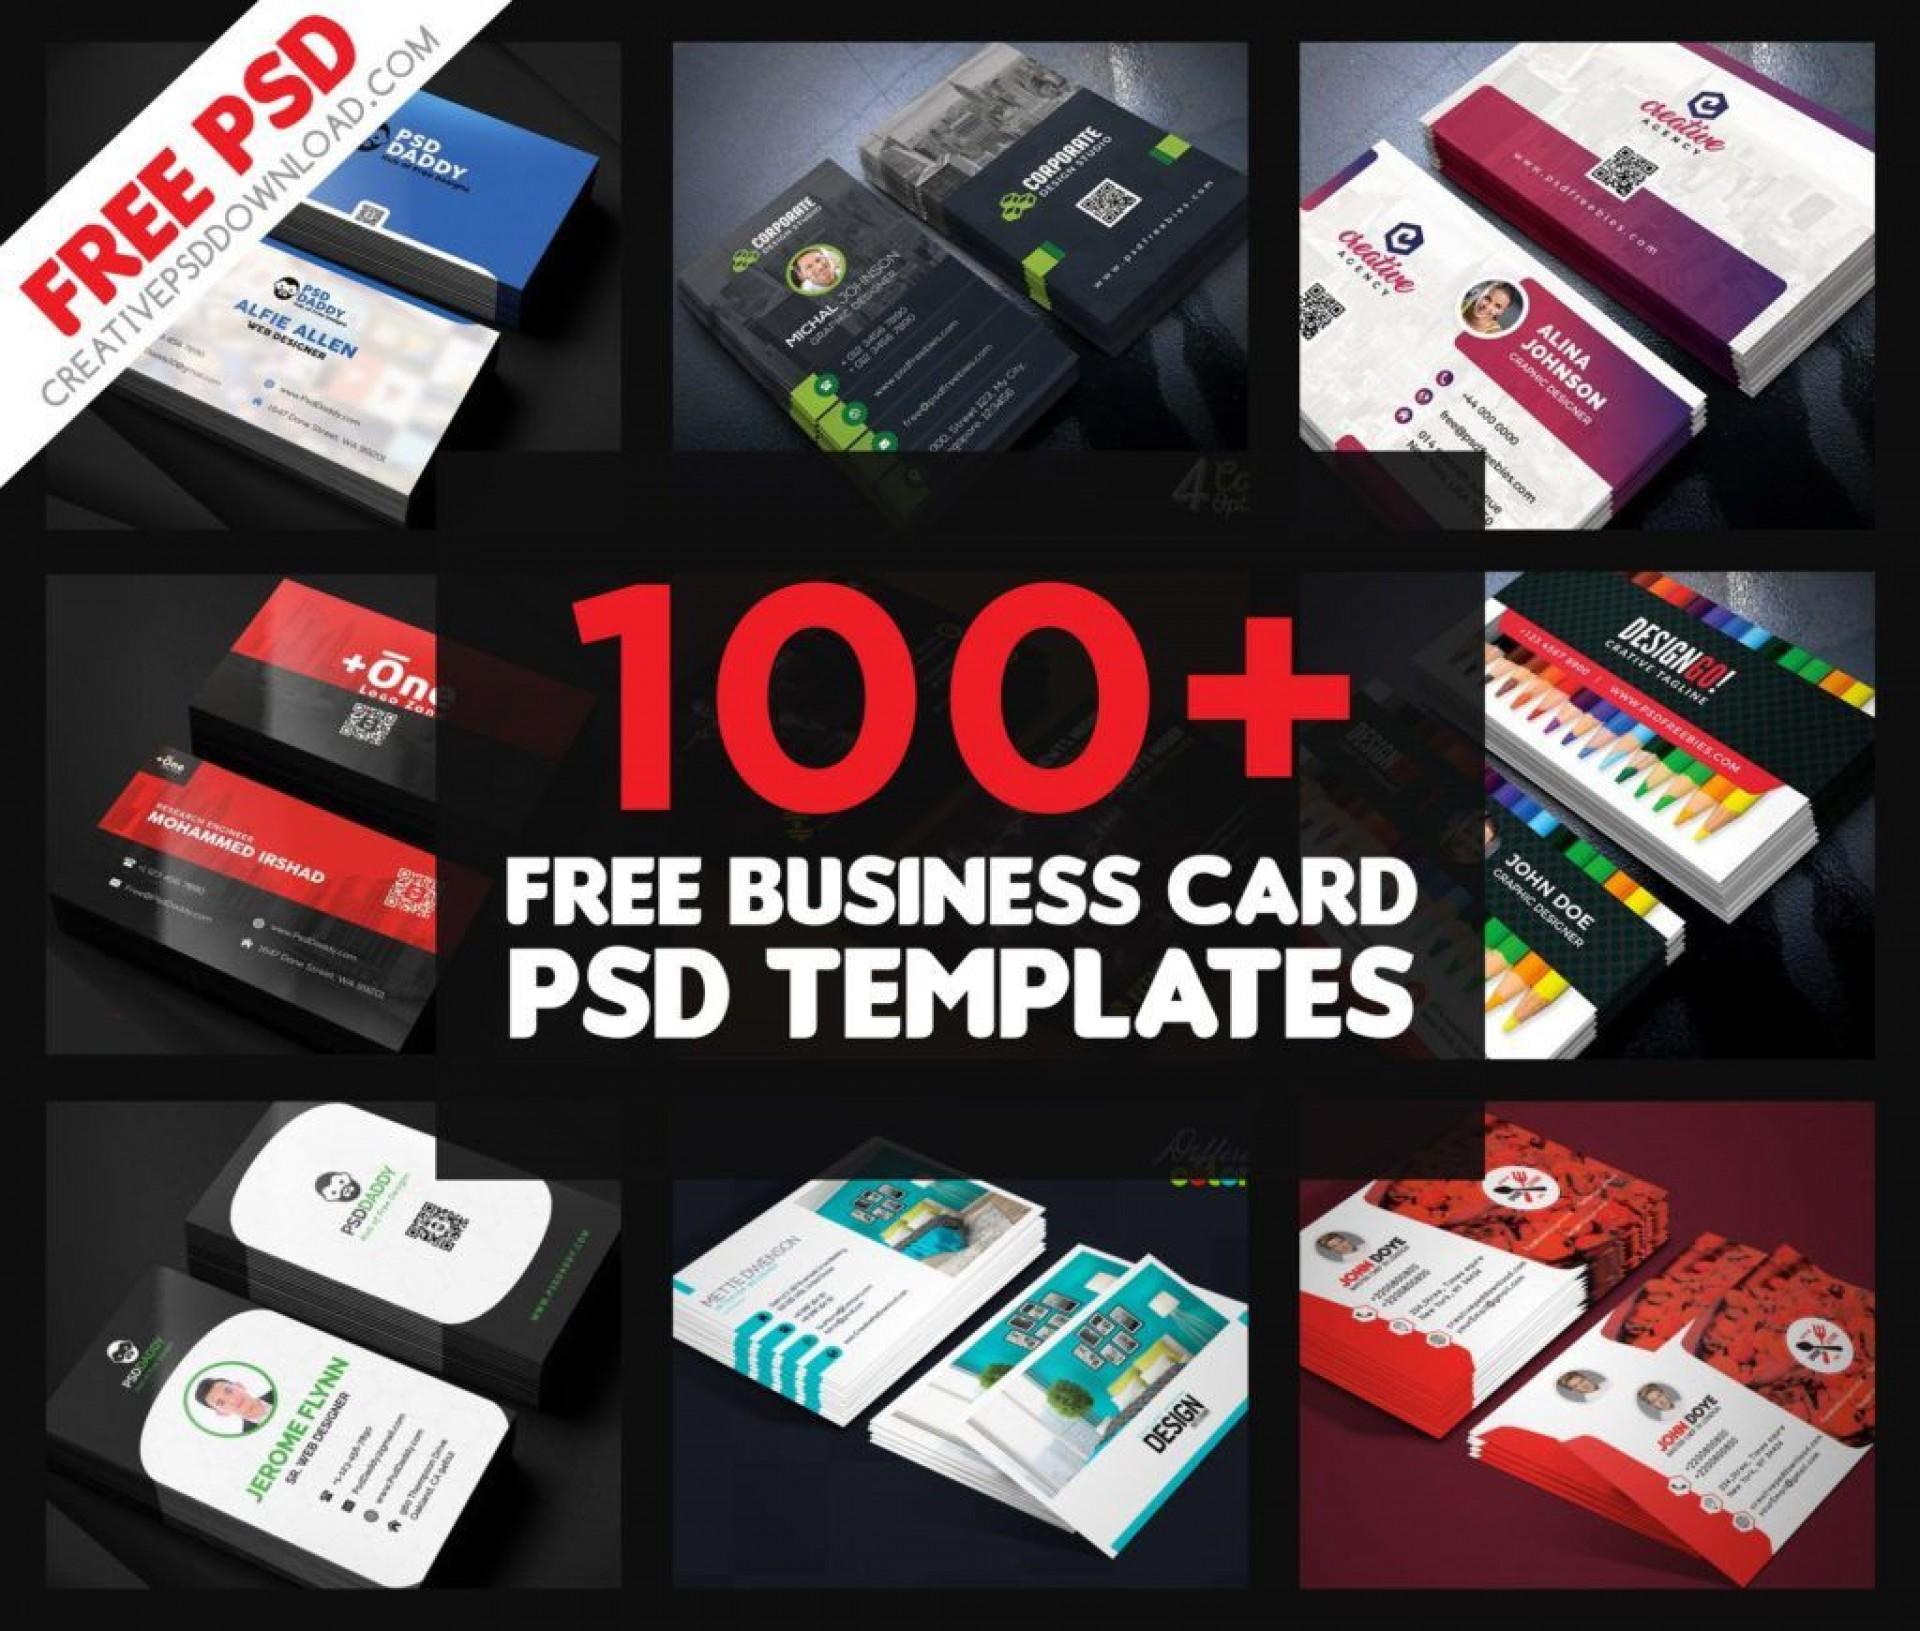 002 Stupendou Minimalist Busines Card Template Psd Free Highest Quality 1920